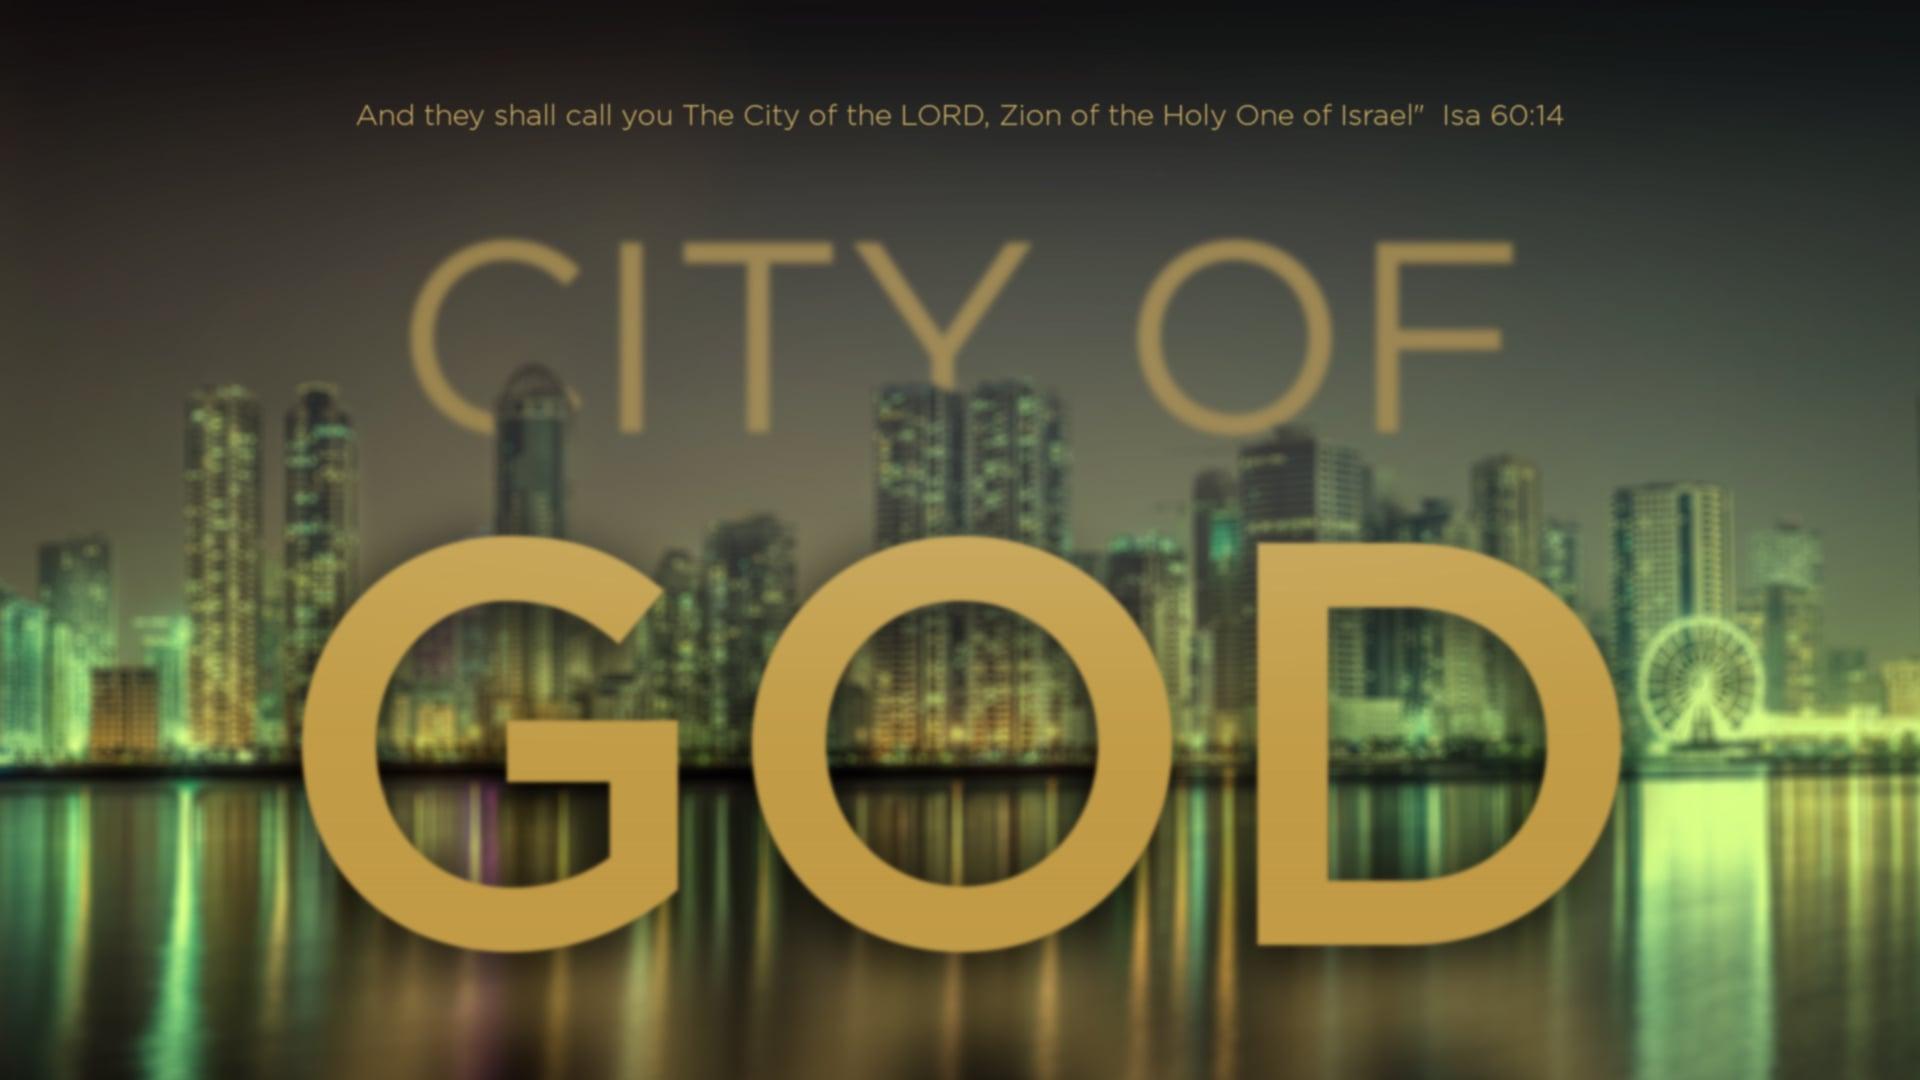 City of God - Part 1